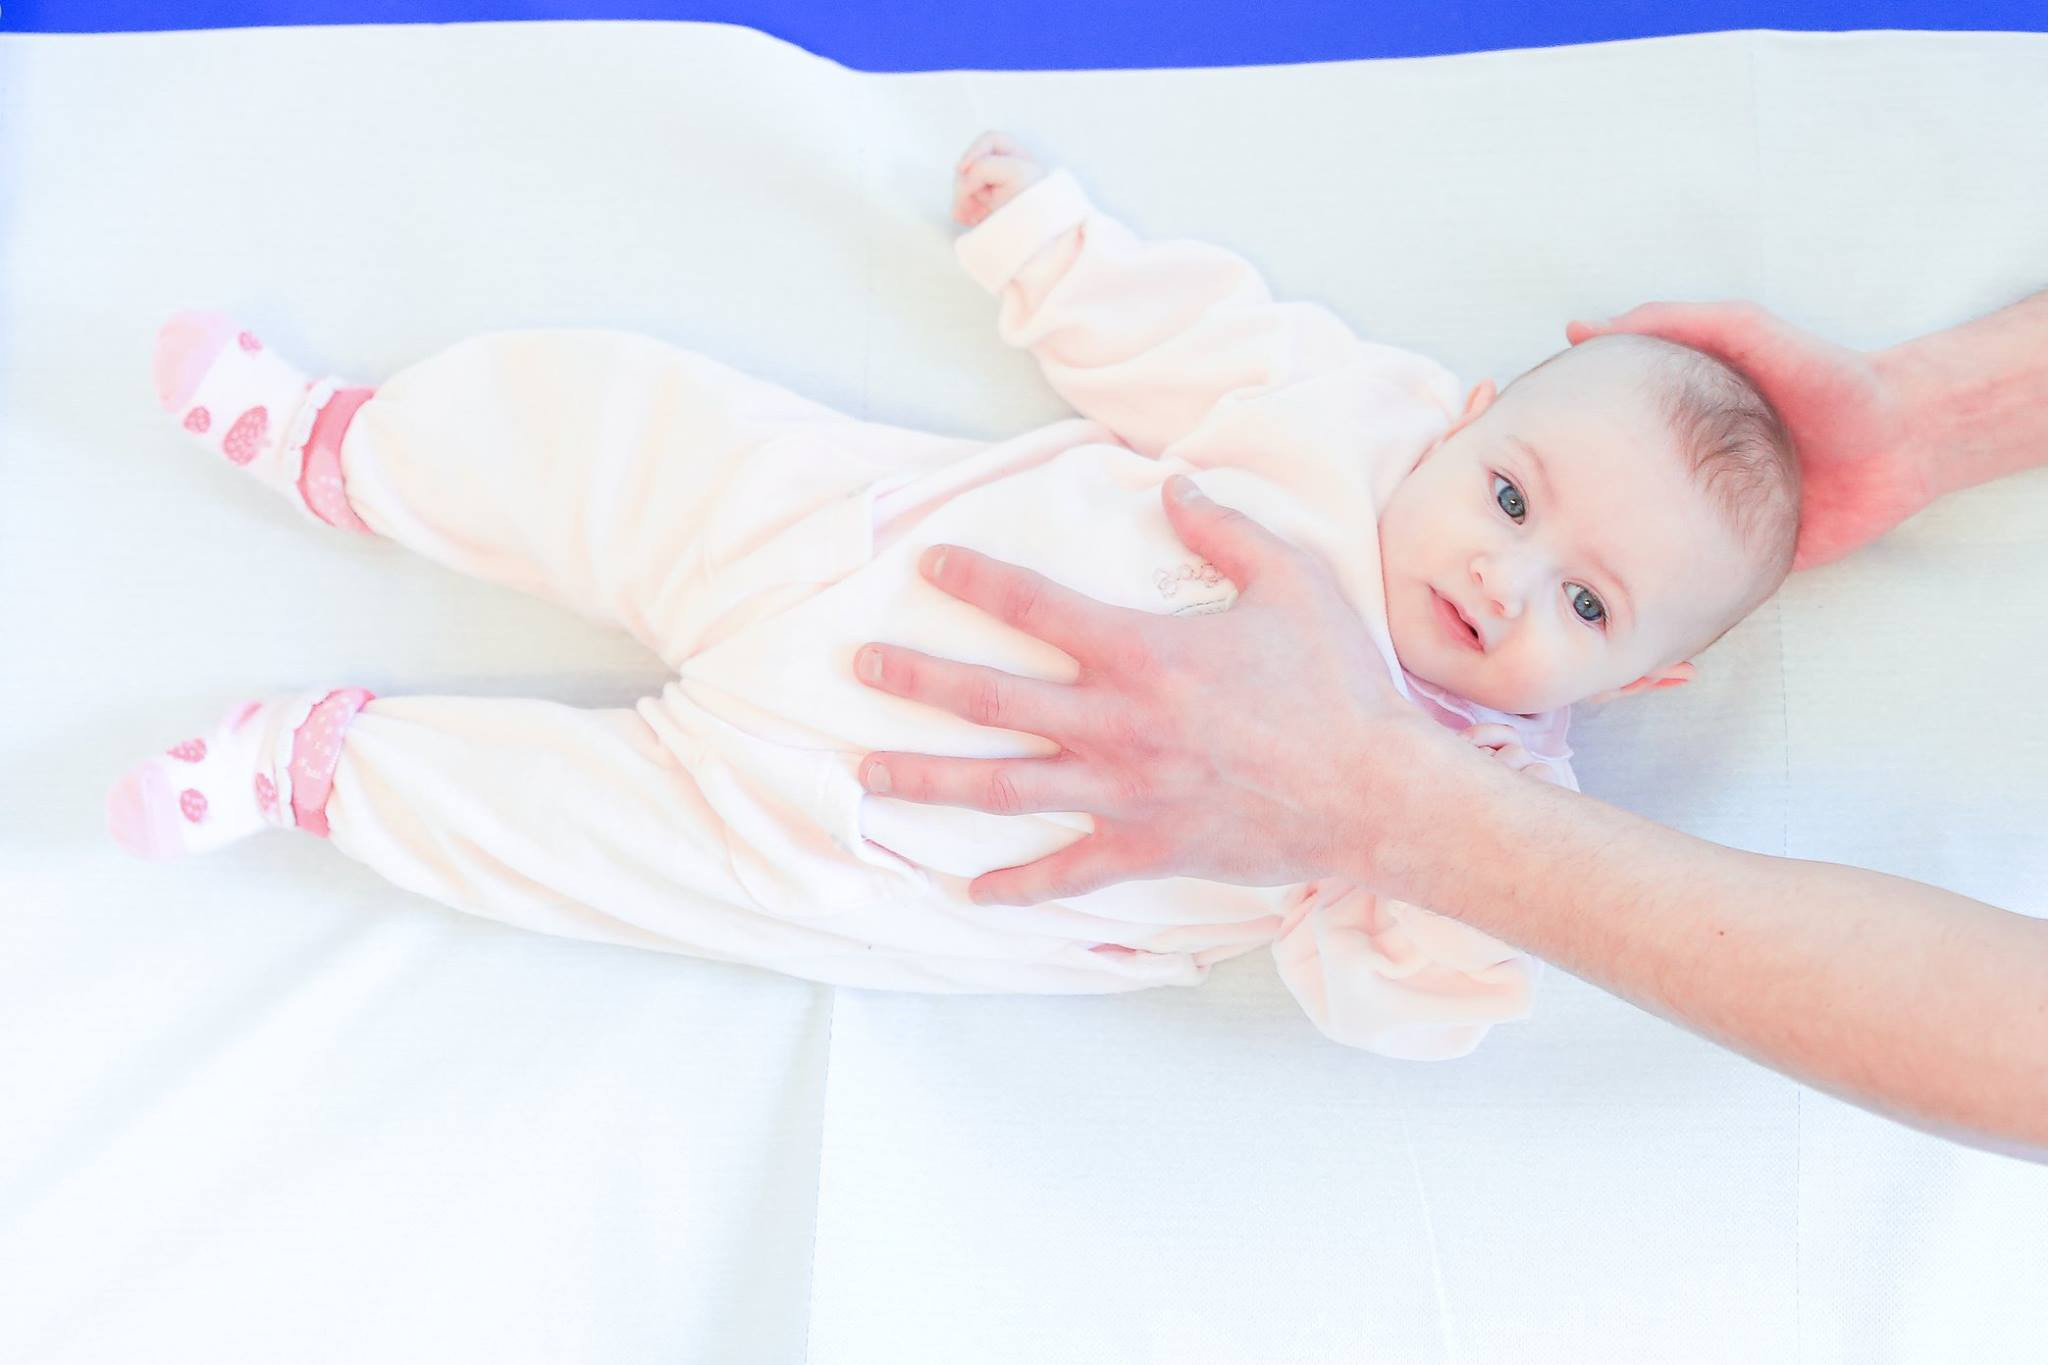 Pediatric Osteopathy